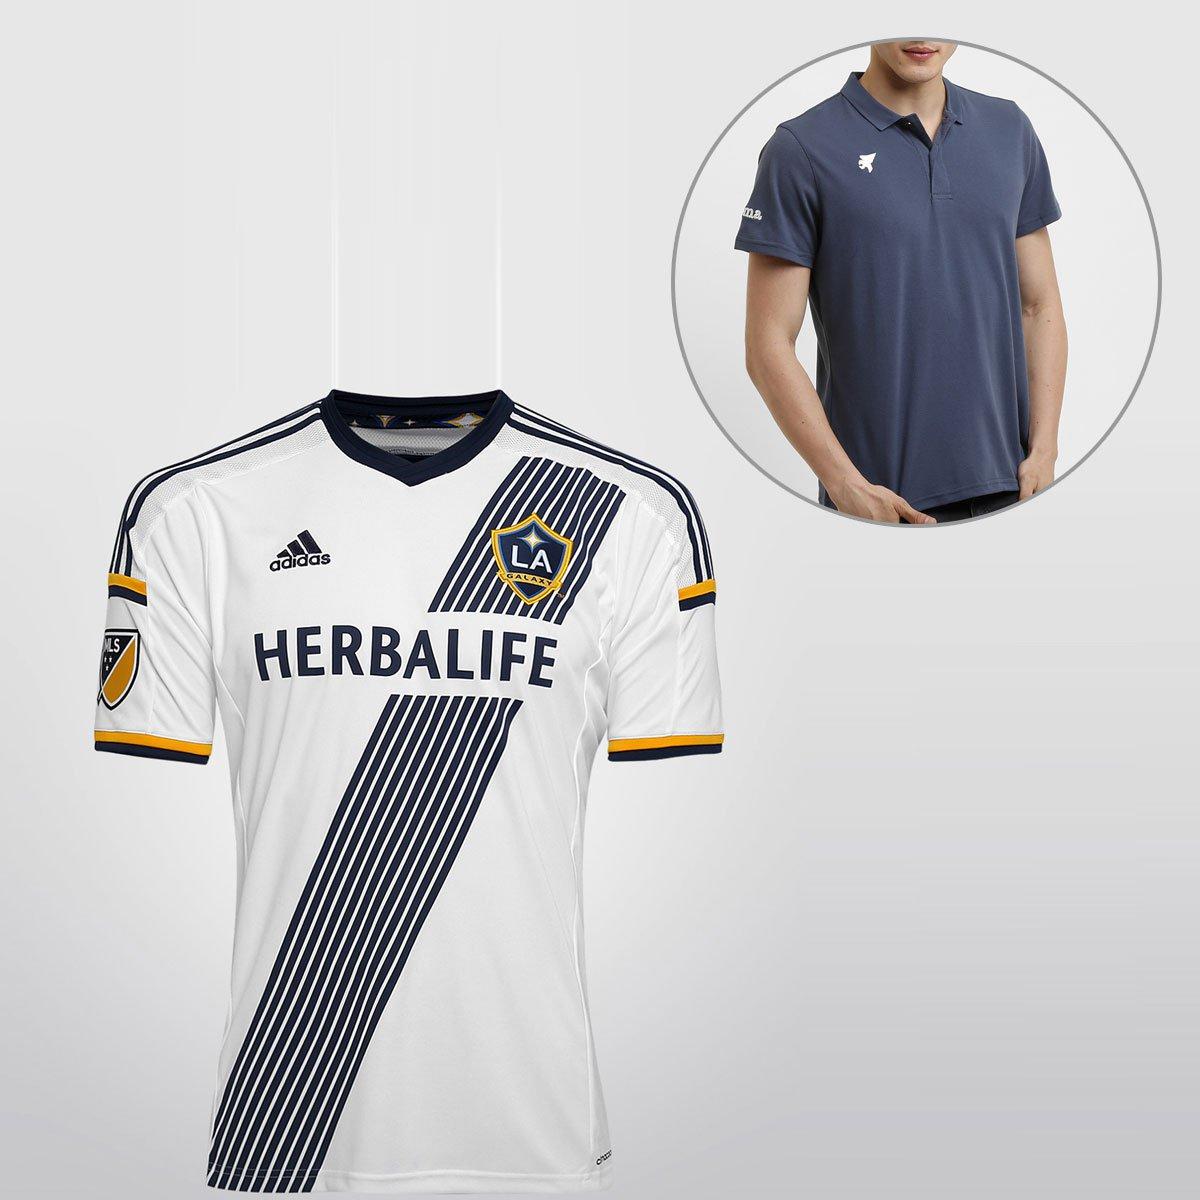 274d880737 Camisa Adidas Los Angeles Galaxy Home 15/16 s/nº + Camisa Polo Joma |  Netshoes